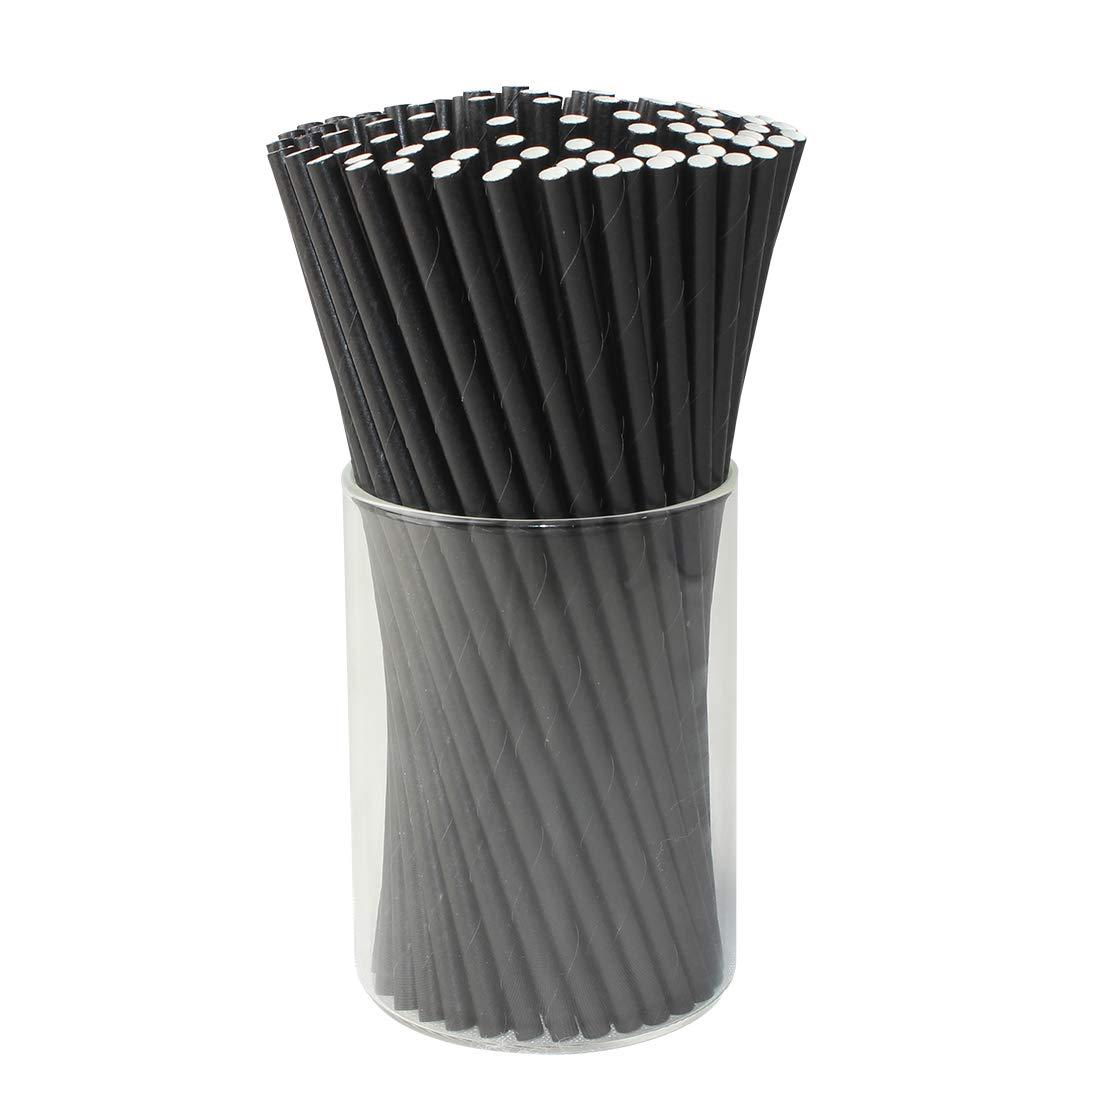 Paper Drink Straws Biodegradable Black - Graduation Party Supplies 100 Pcs Eco-frendly Straws Bulk for Birthday | Wedding | Bachelorette | Baby Shower | DIY Idea